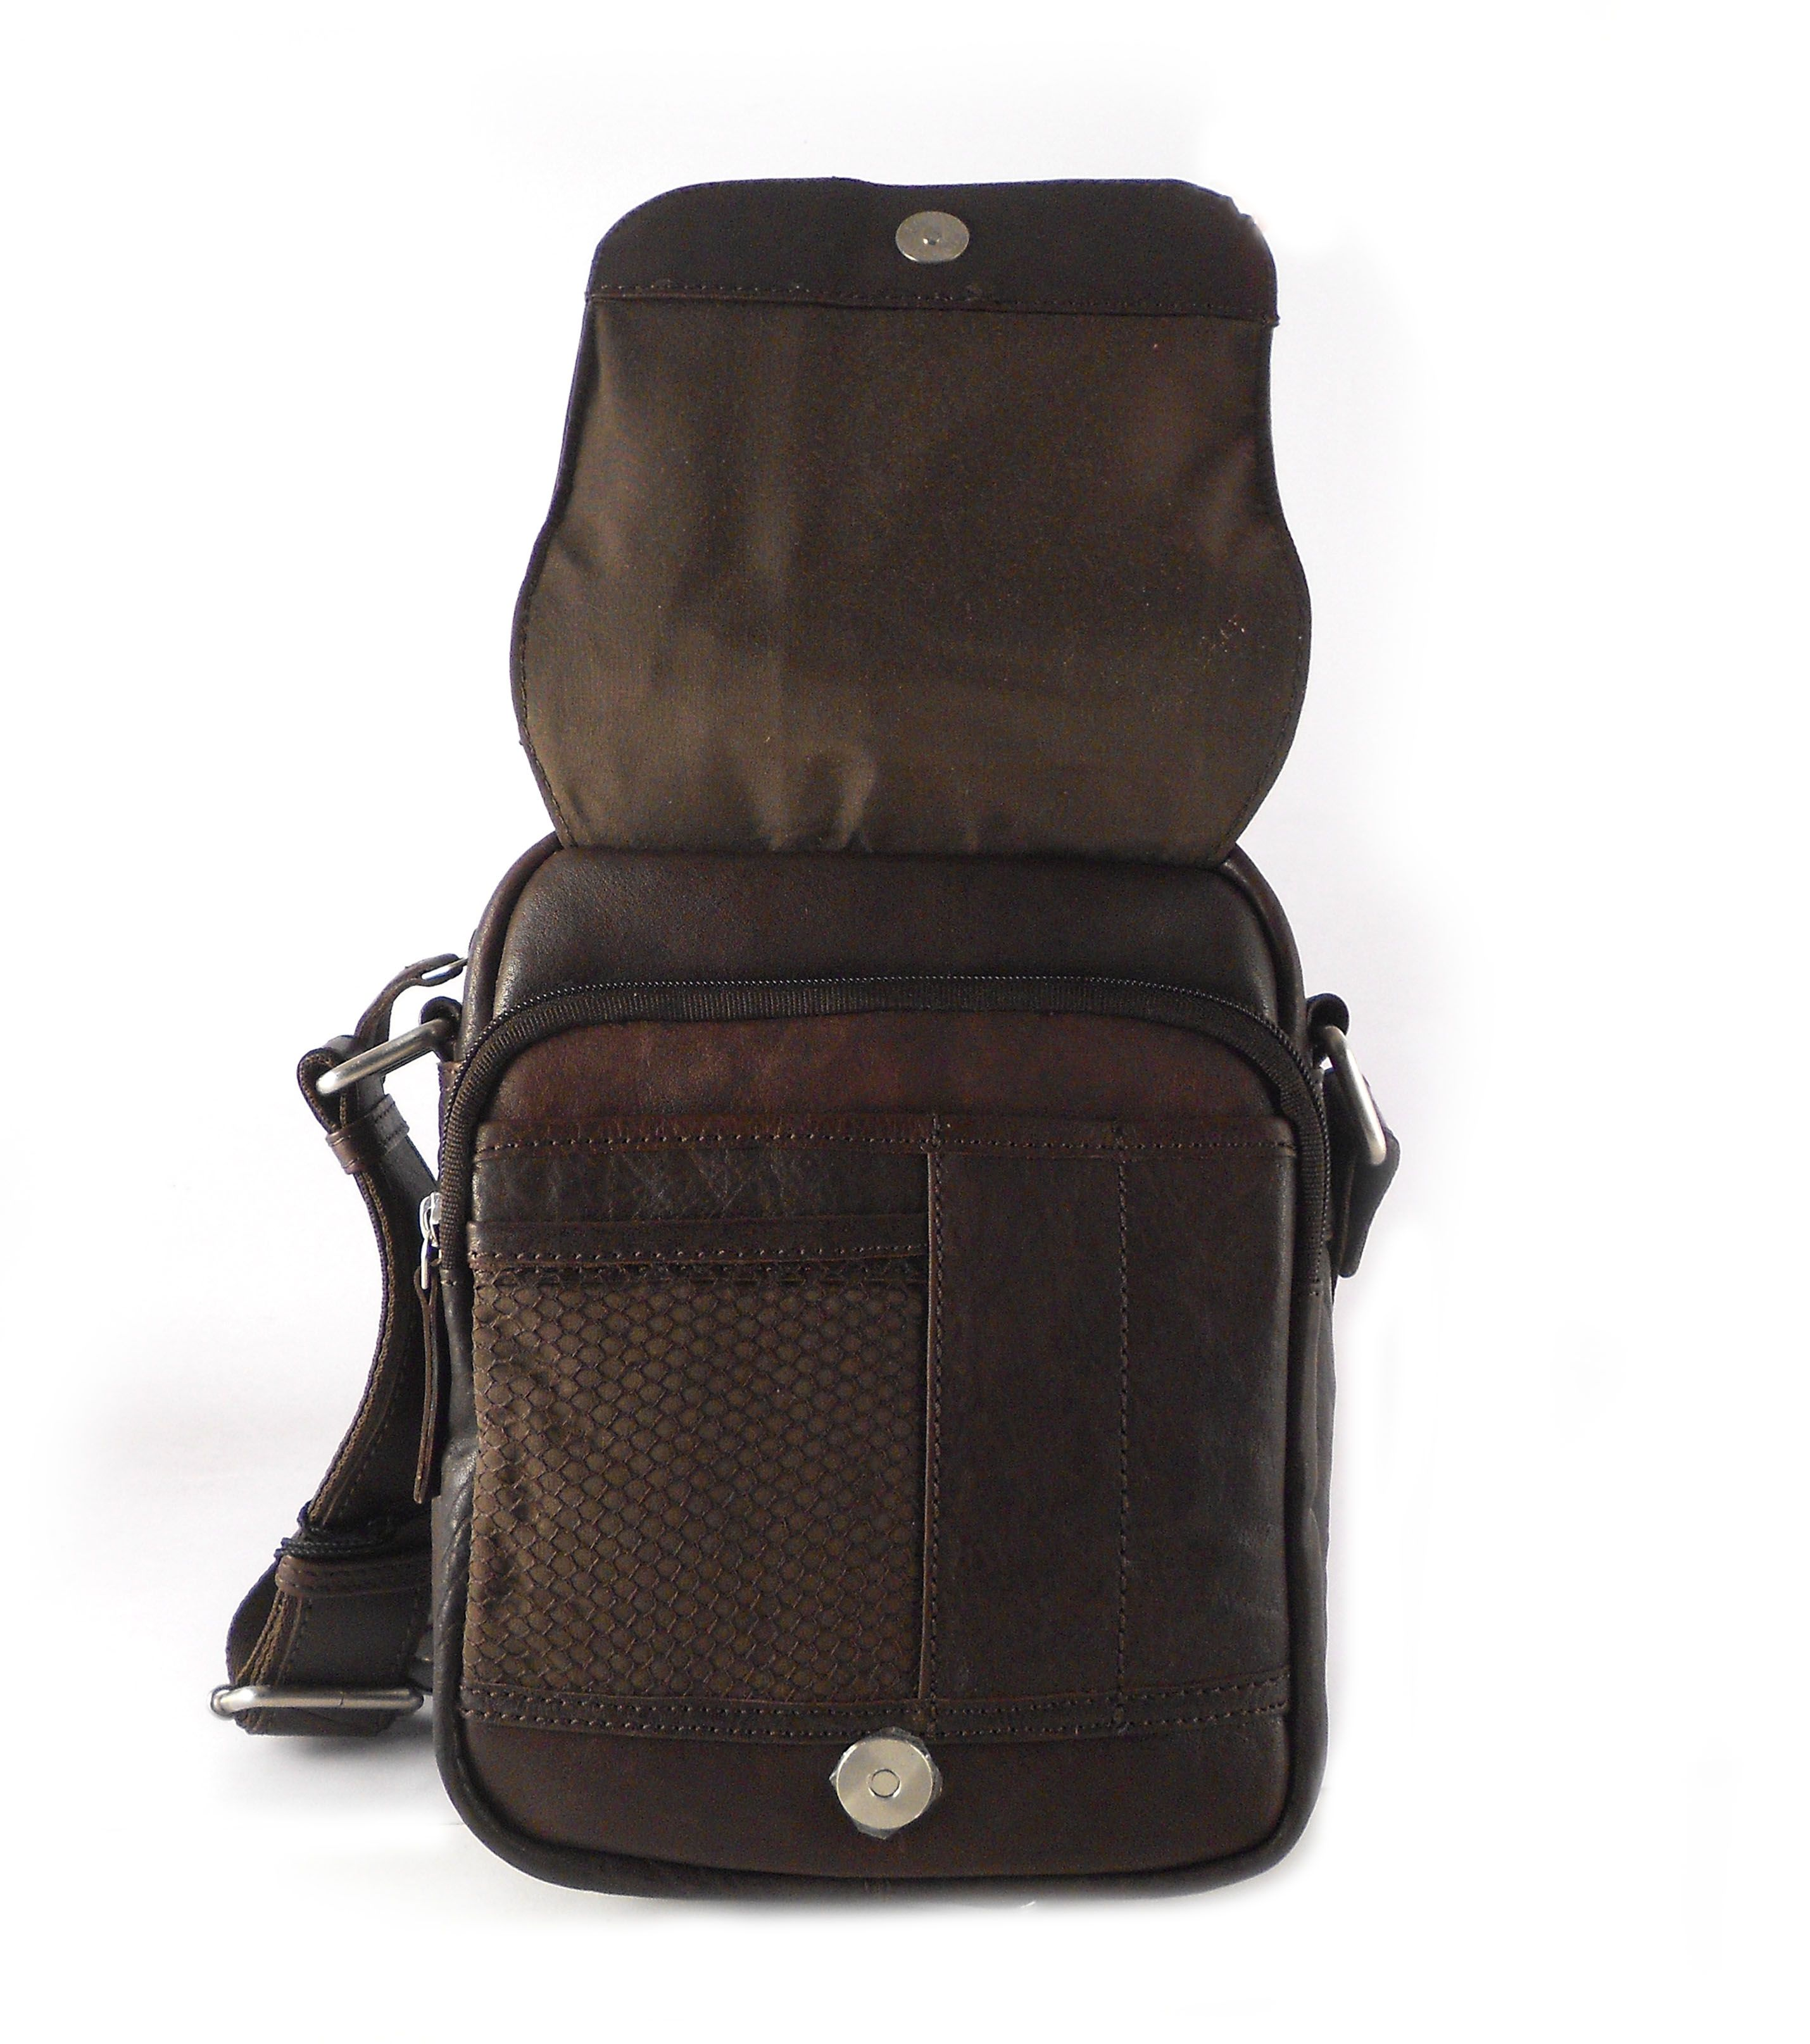 9c41f8e66 Bolso hombre piel Matties con solapa color marrón